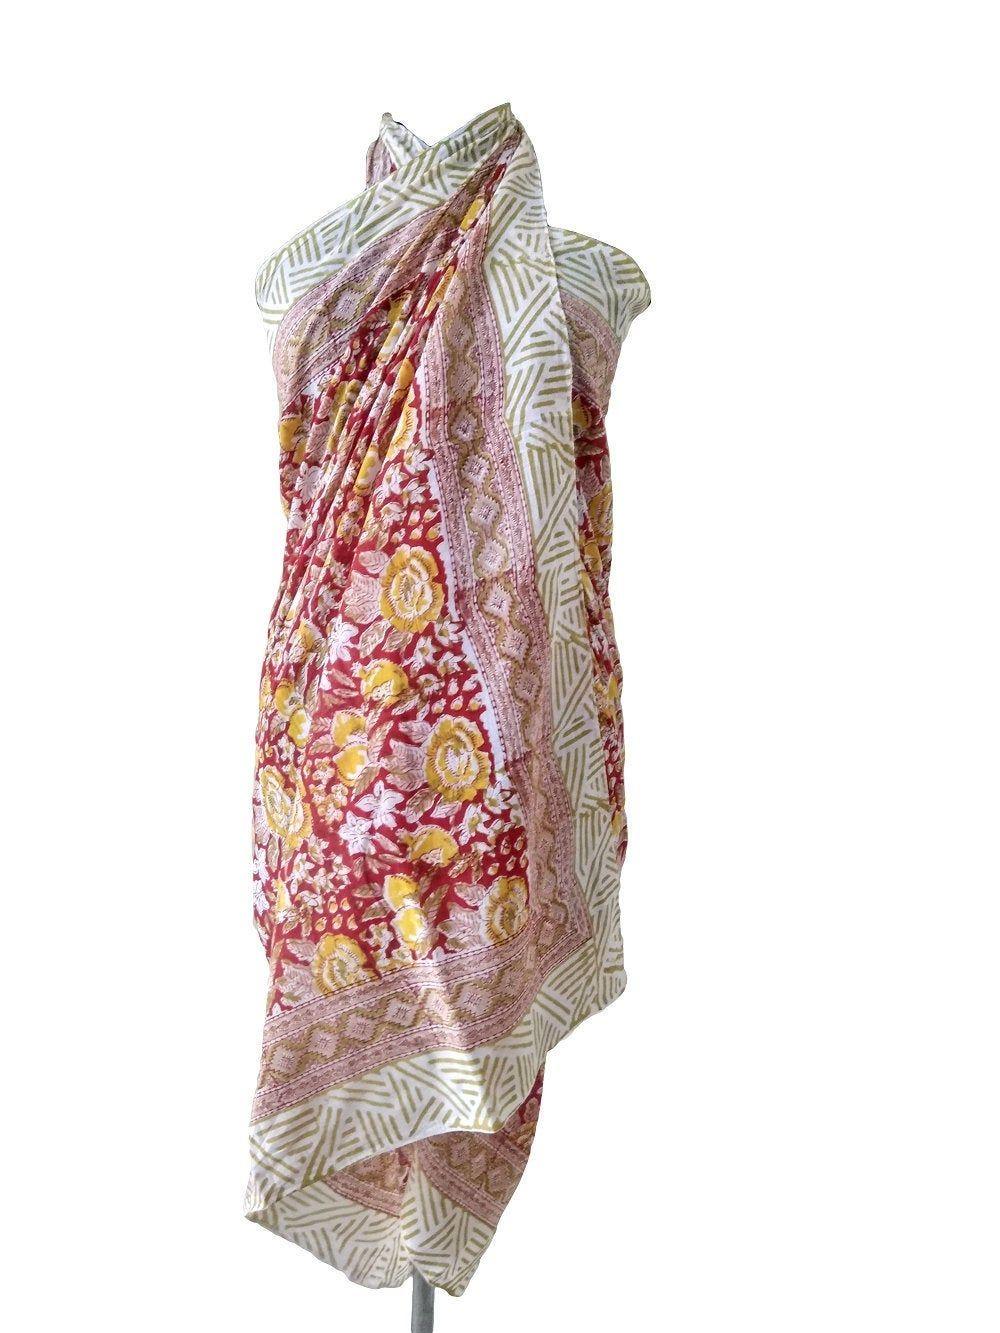 Indian cotton sarongs hand block print Bikini Cover Up Neck Scarf Plus Size Scarves 72 x 42 inch Women Beach Wear Comfort All Season Boho